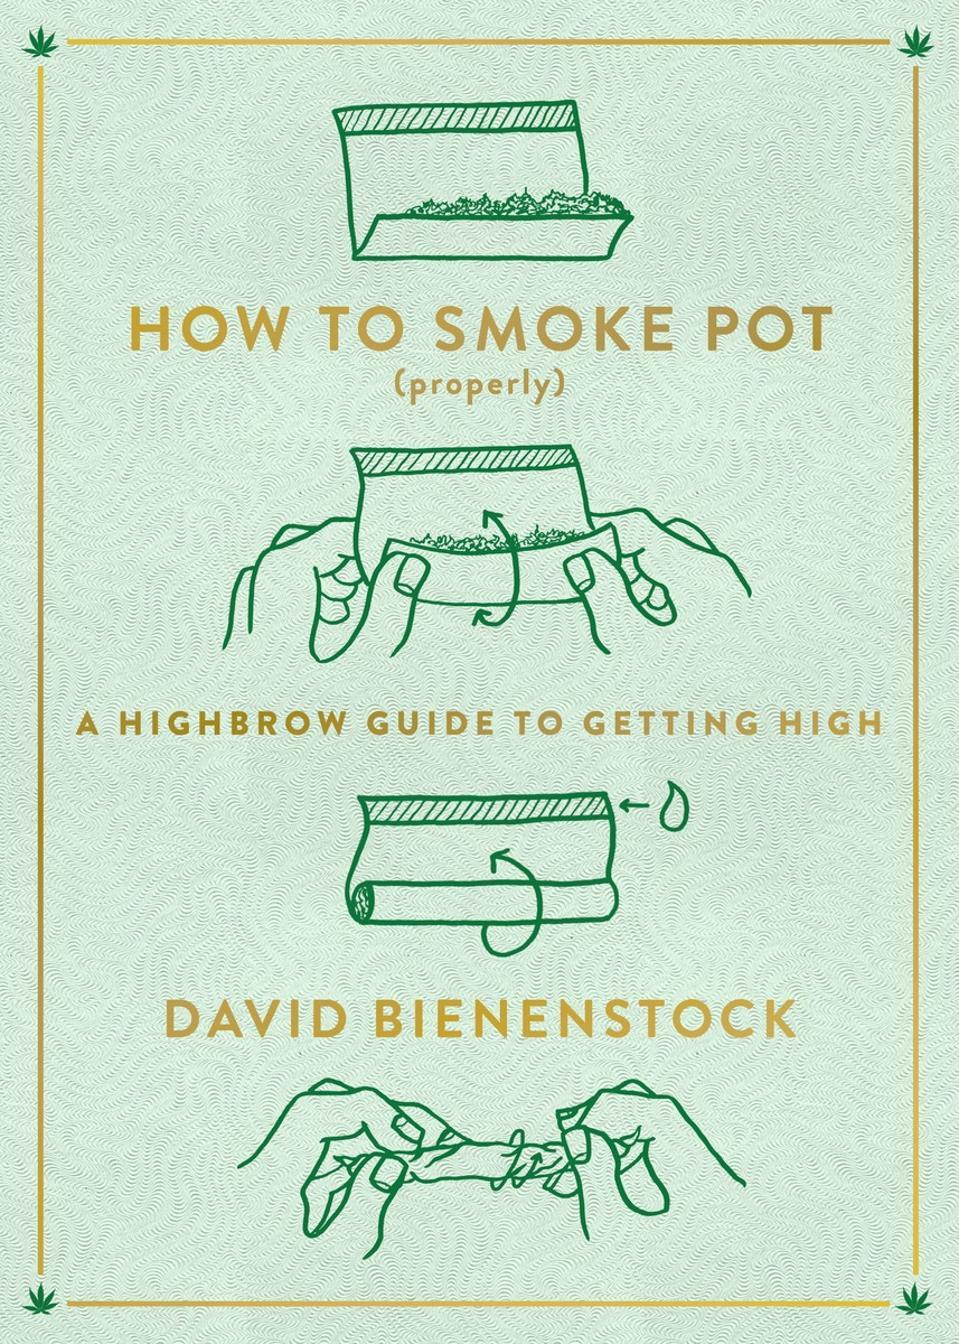 David Bienenstock, How to Smoke Pot (Properly), cannabis books, cannabis culture